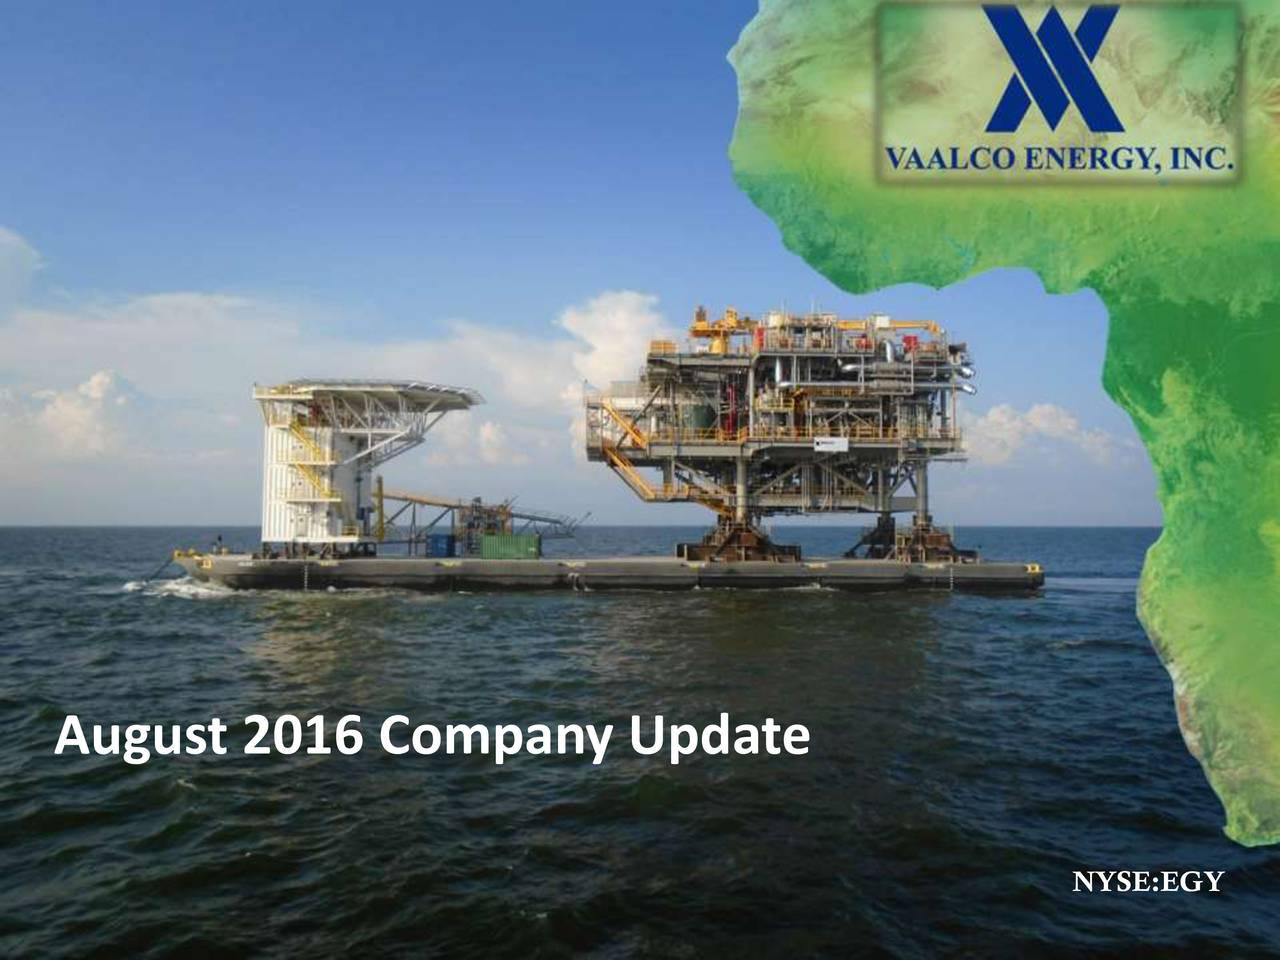 NYSE:EGY VAALCO Energy, Inc. 1